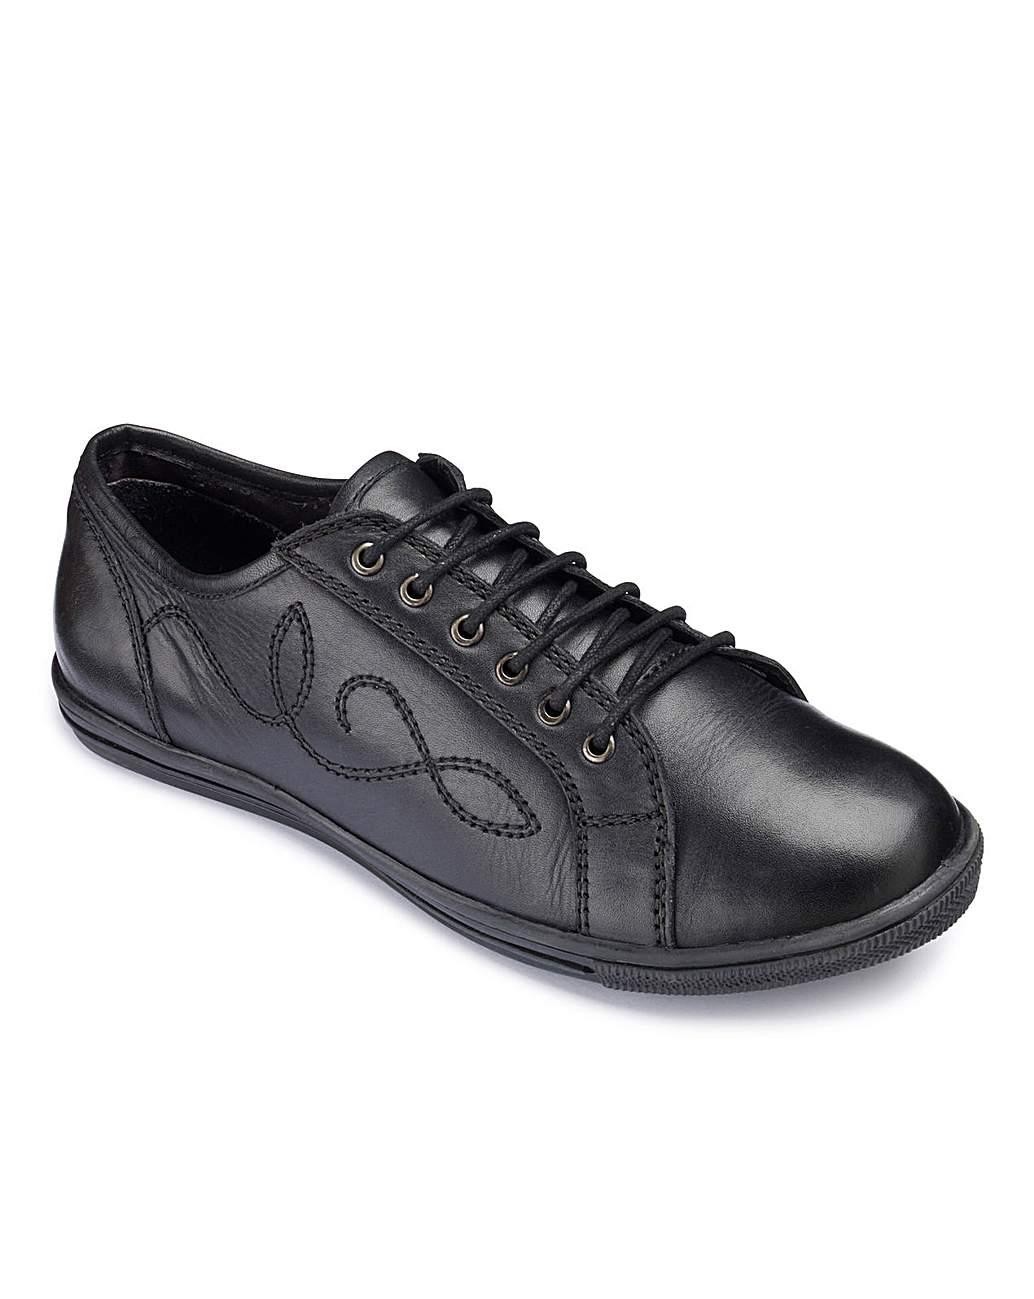 Girls Lace Up School Shoes Wide Fit | J